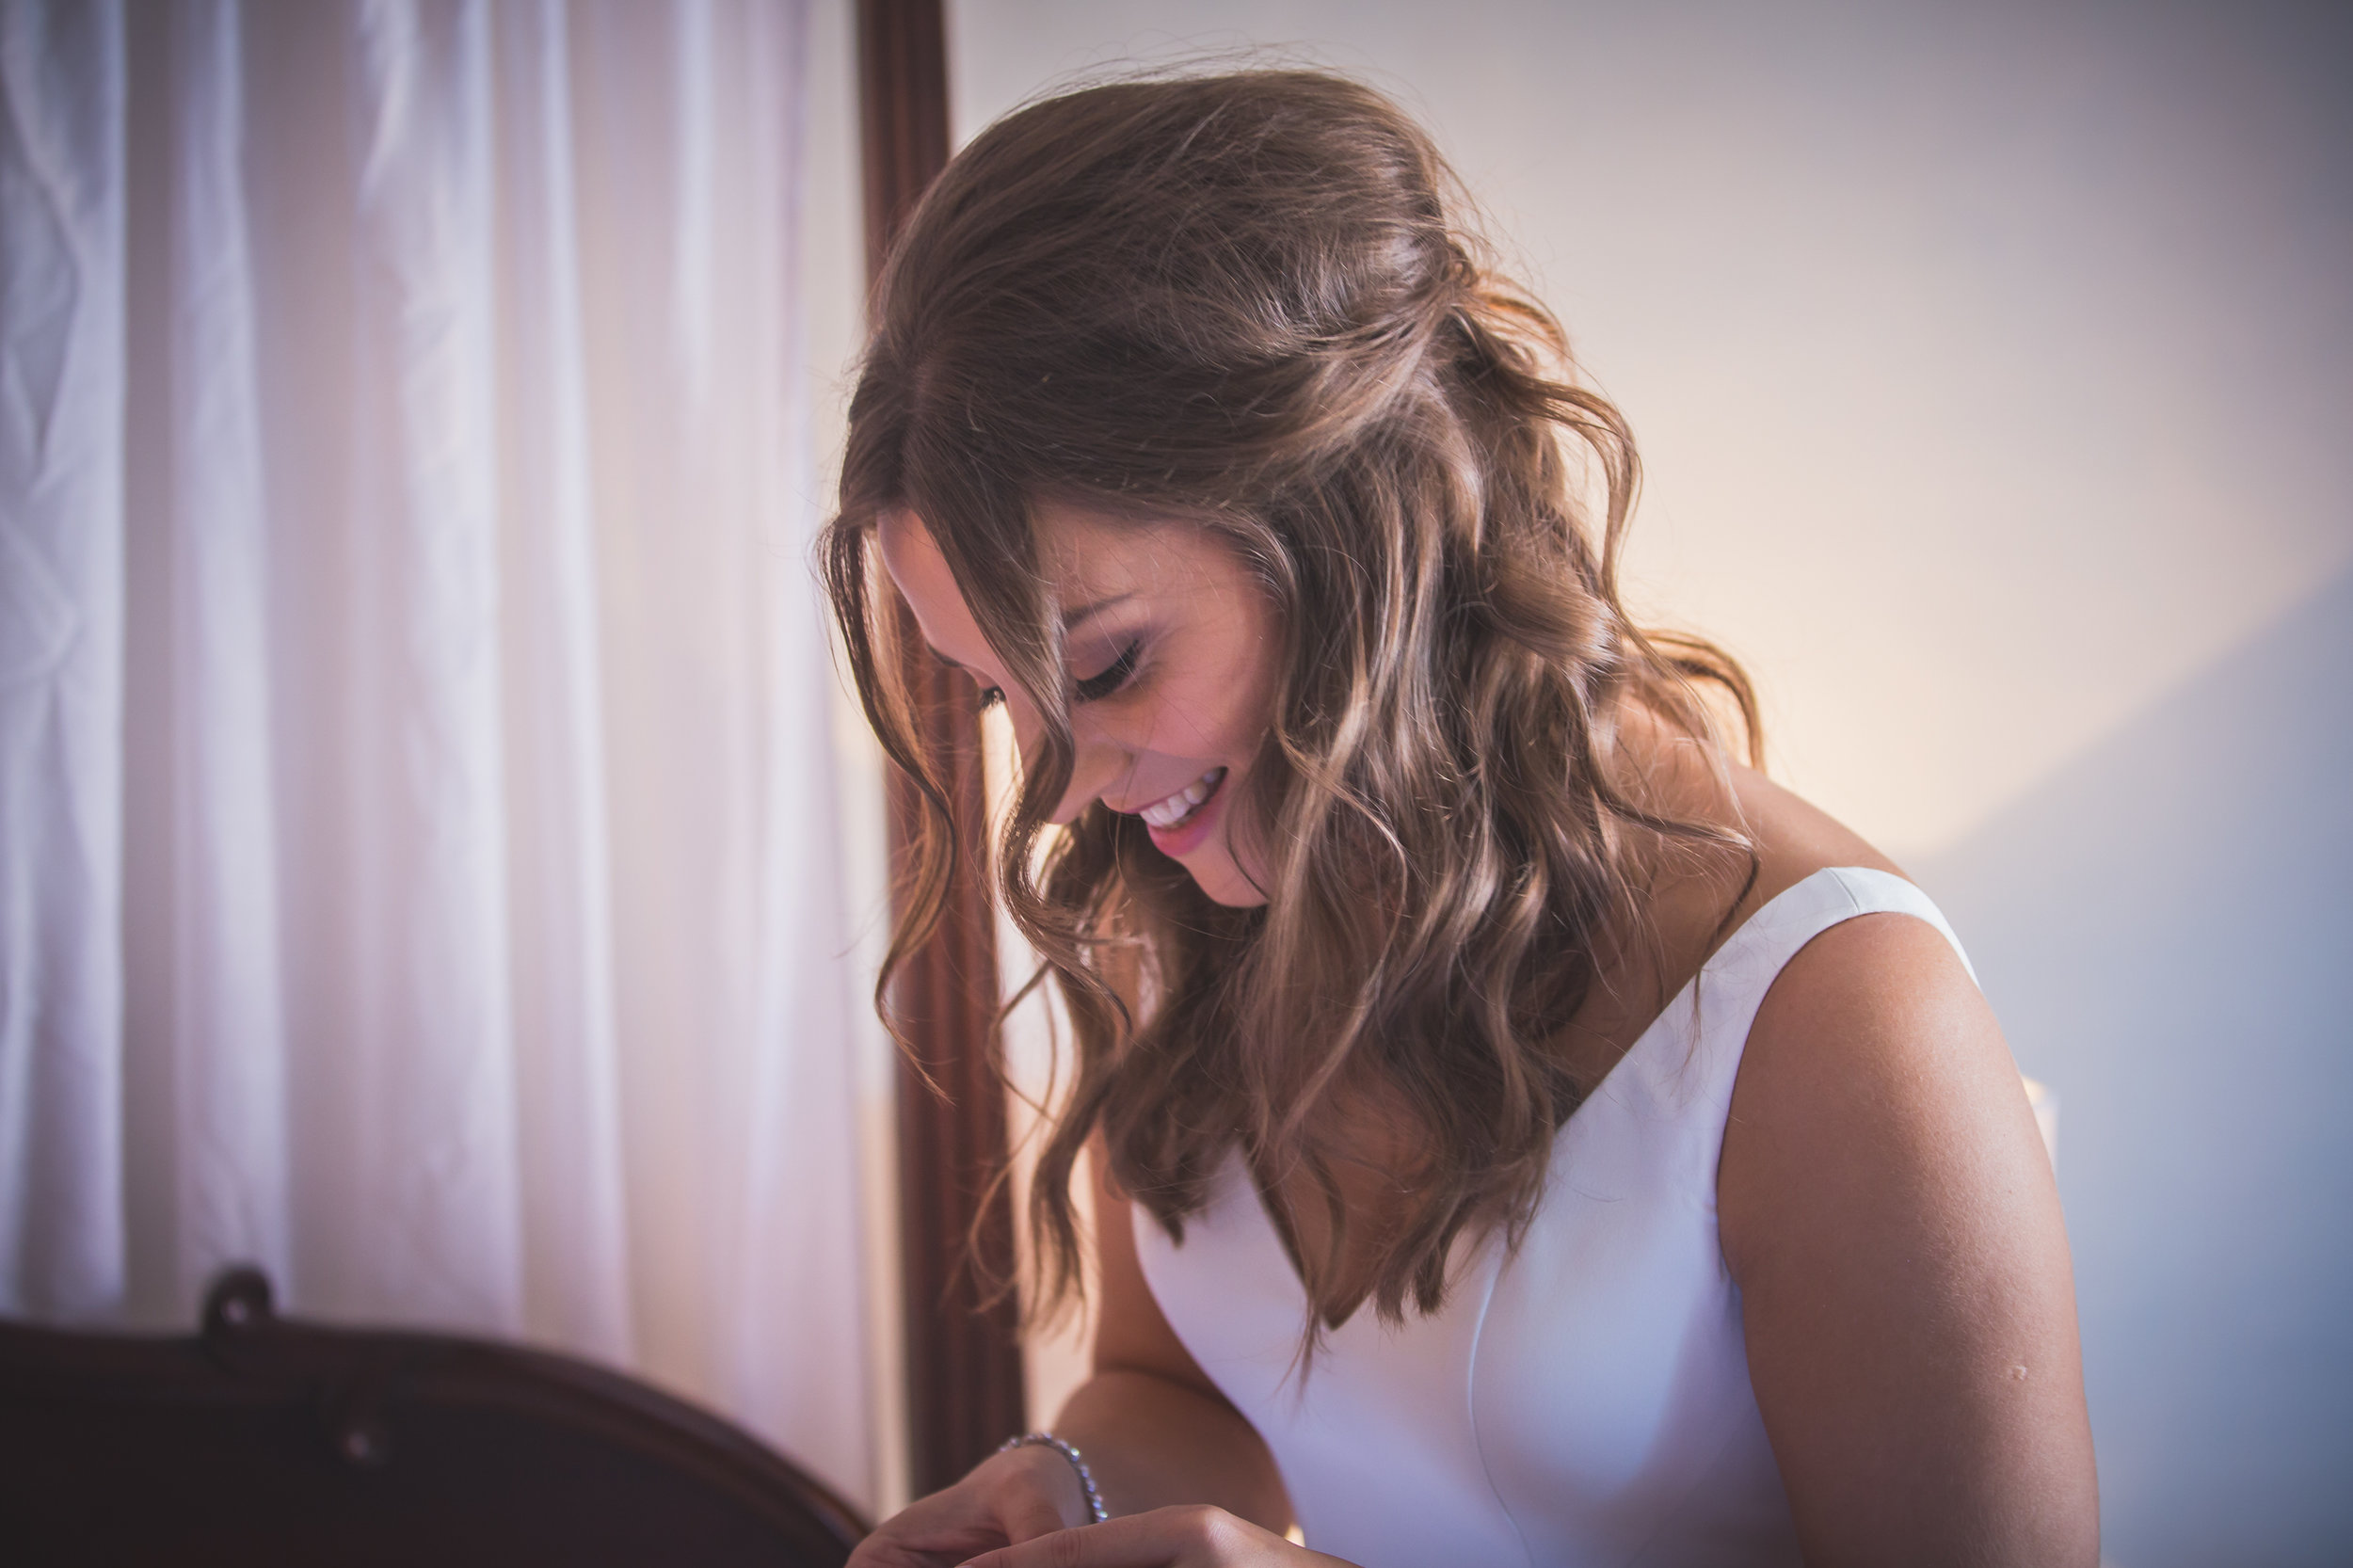 Grittenham Barn female wedding photographers west sussex petworth social-18.jpg